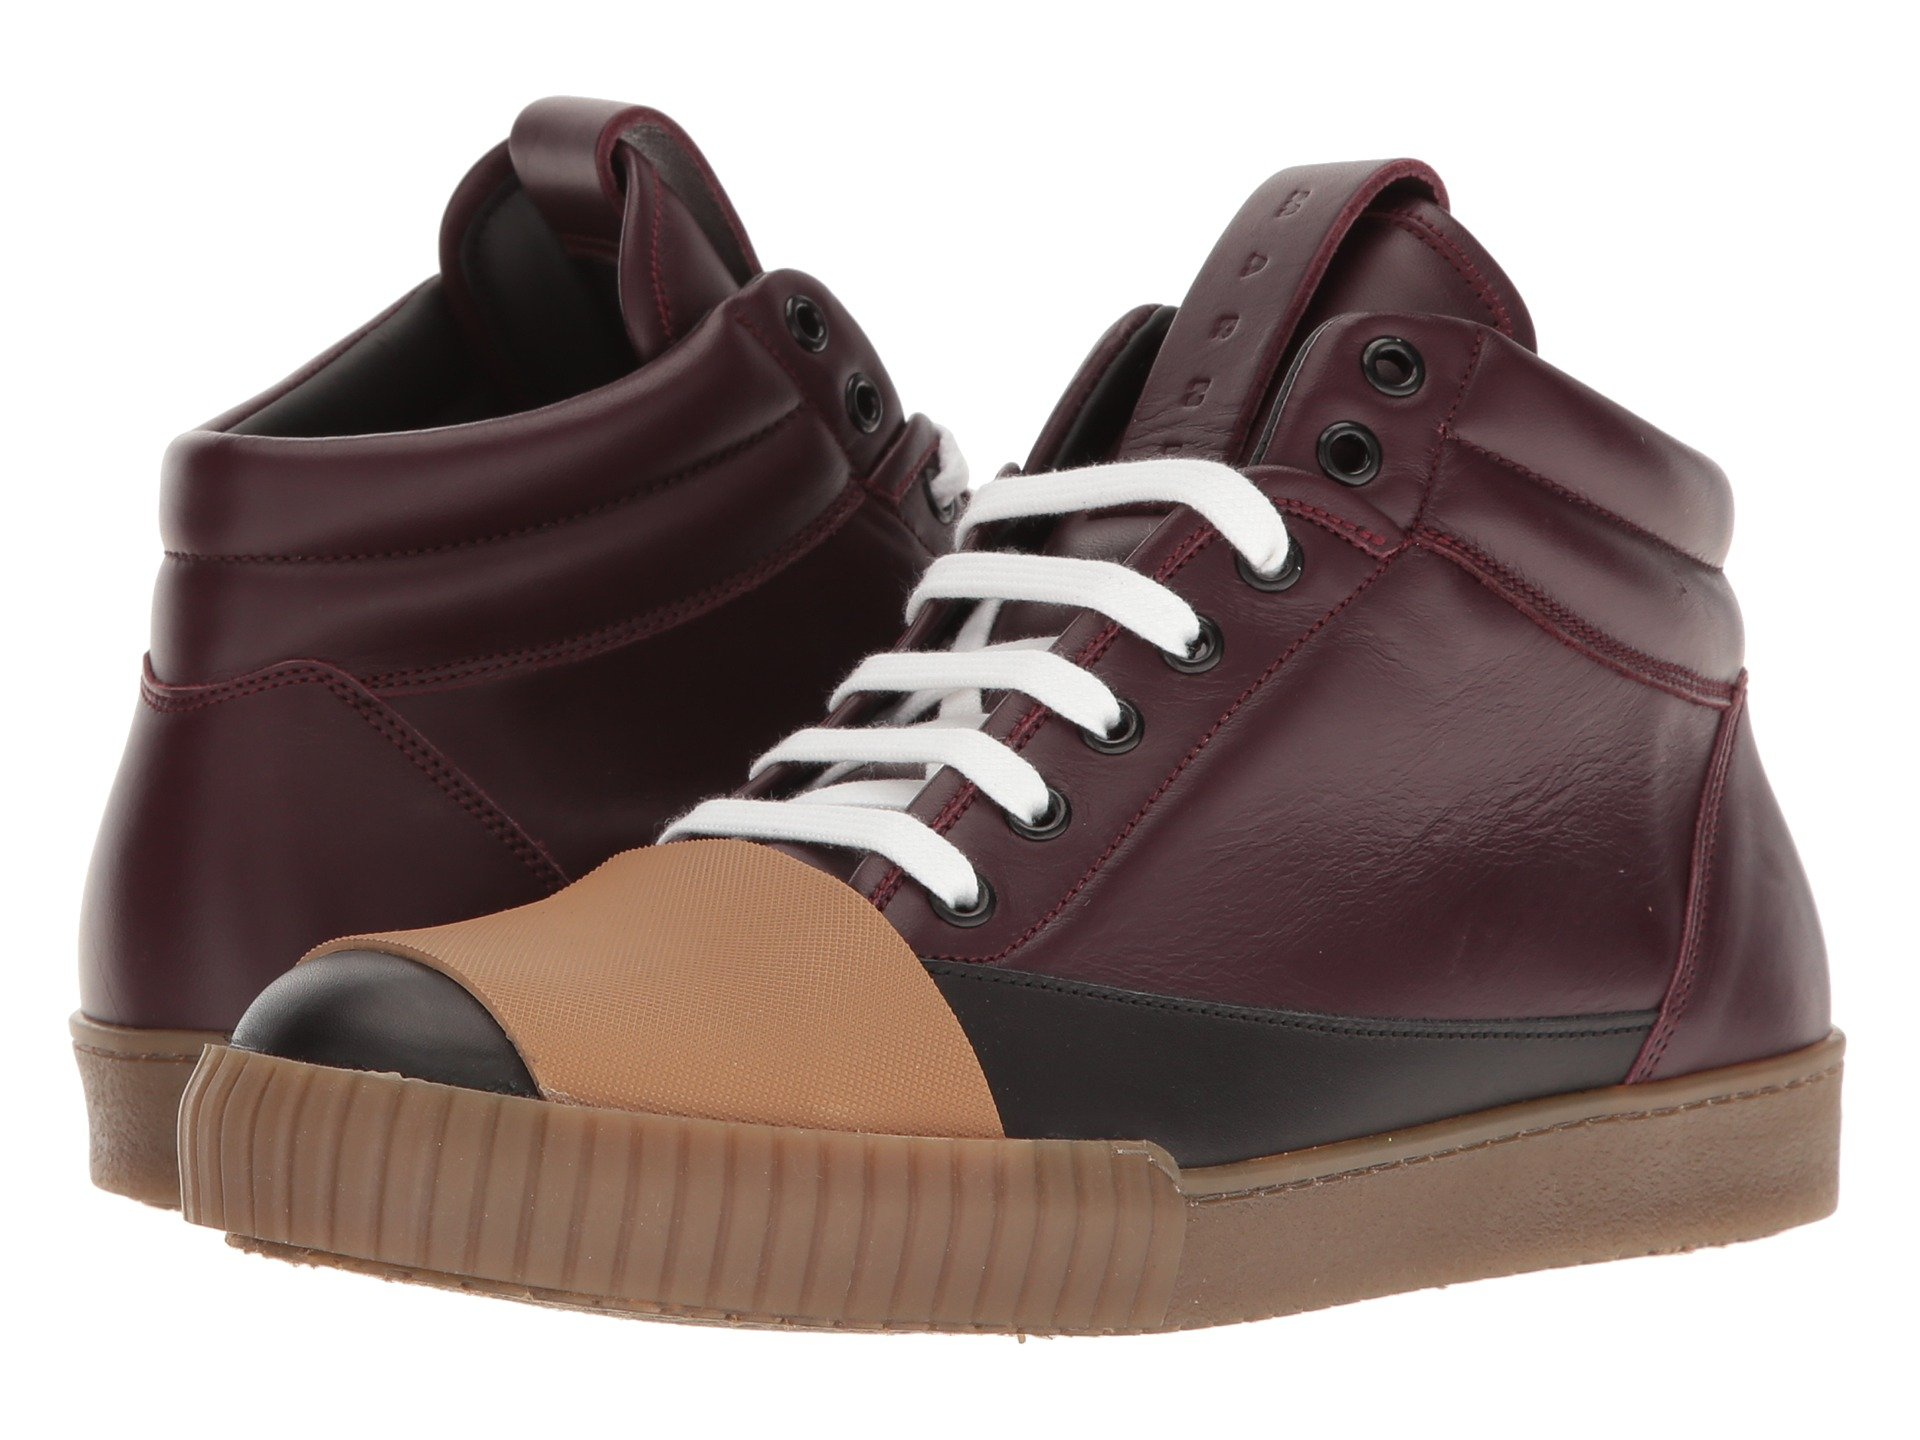 Banded High Top Sneaker MARNI ZNVBE